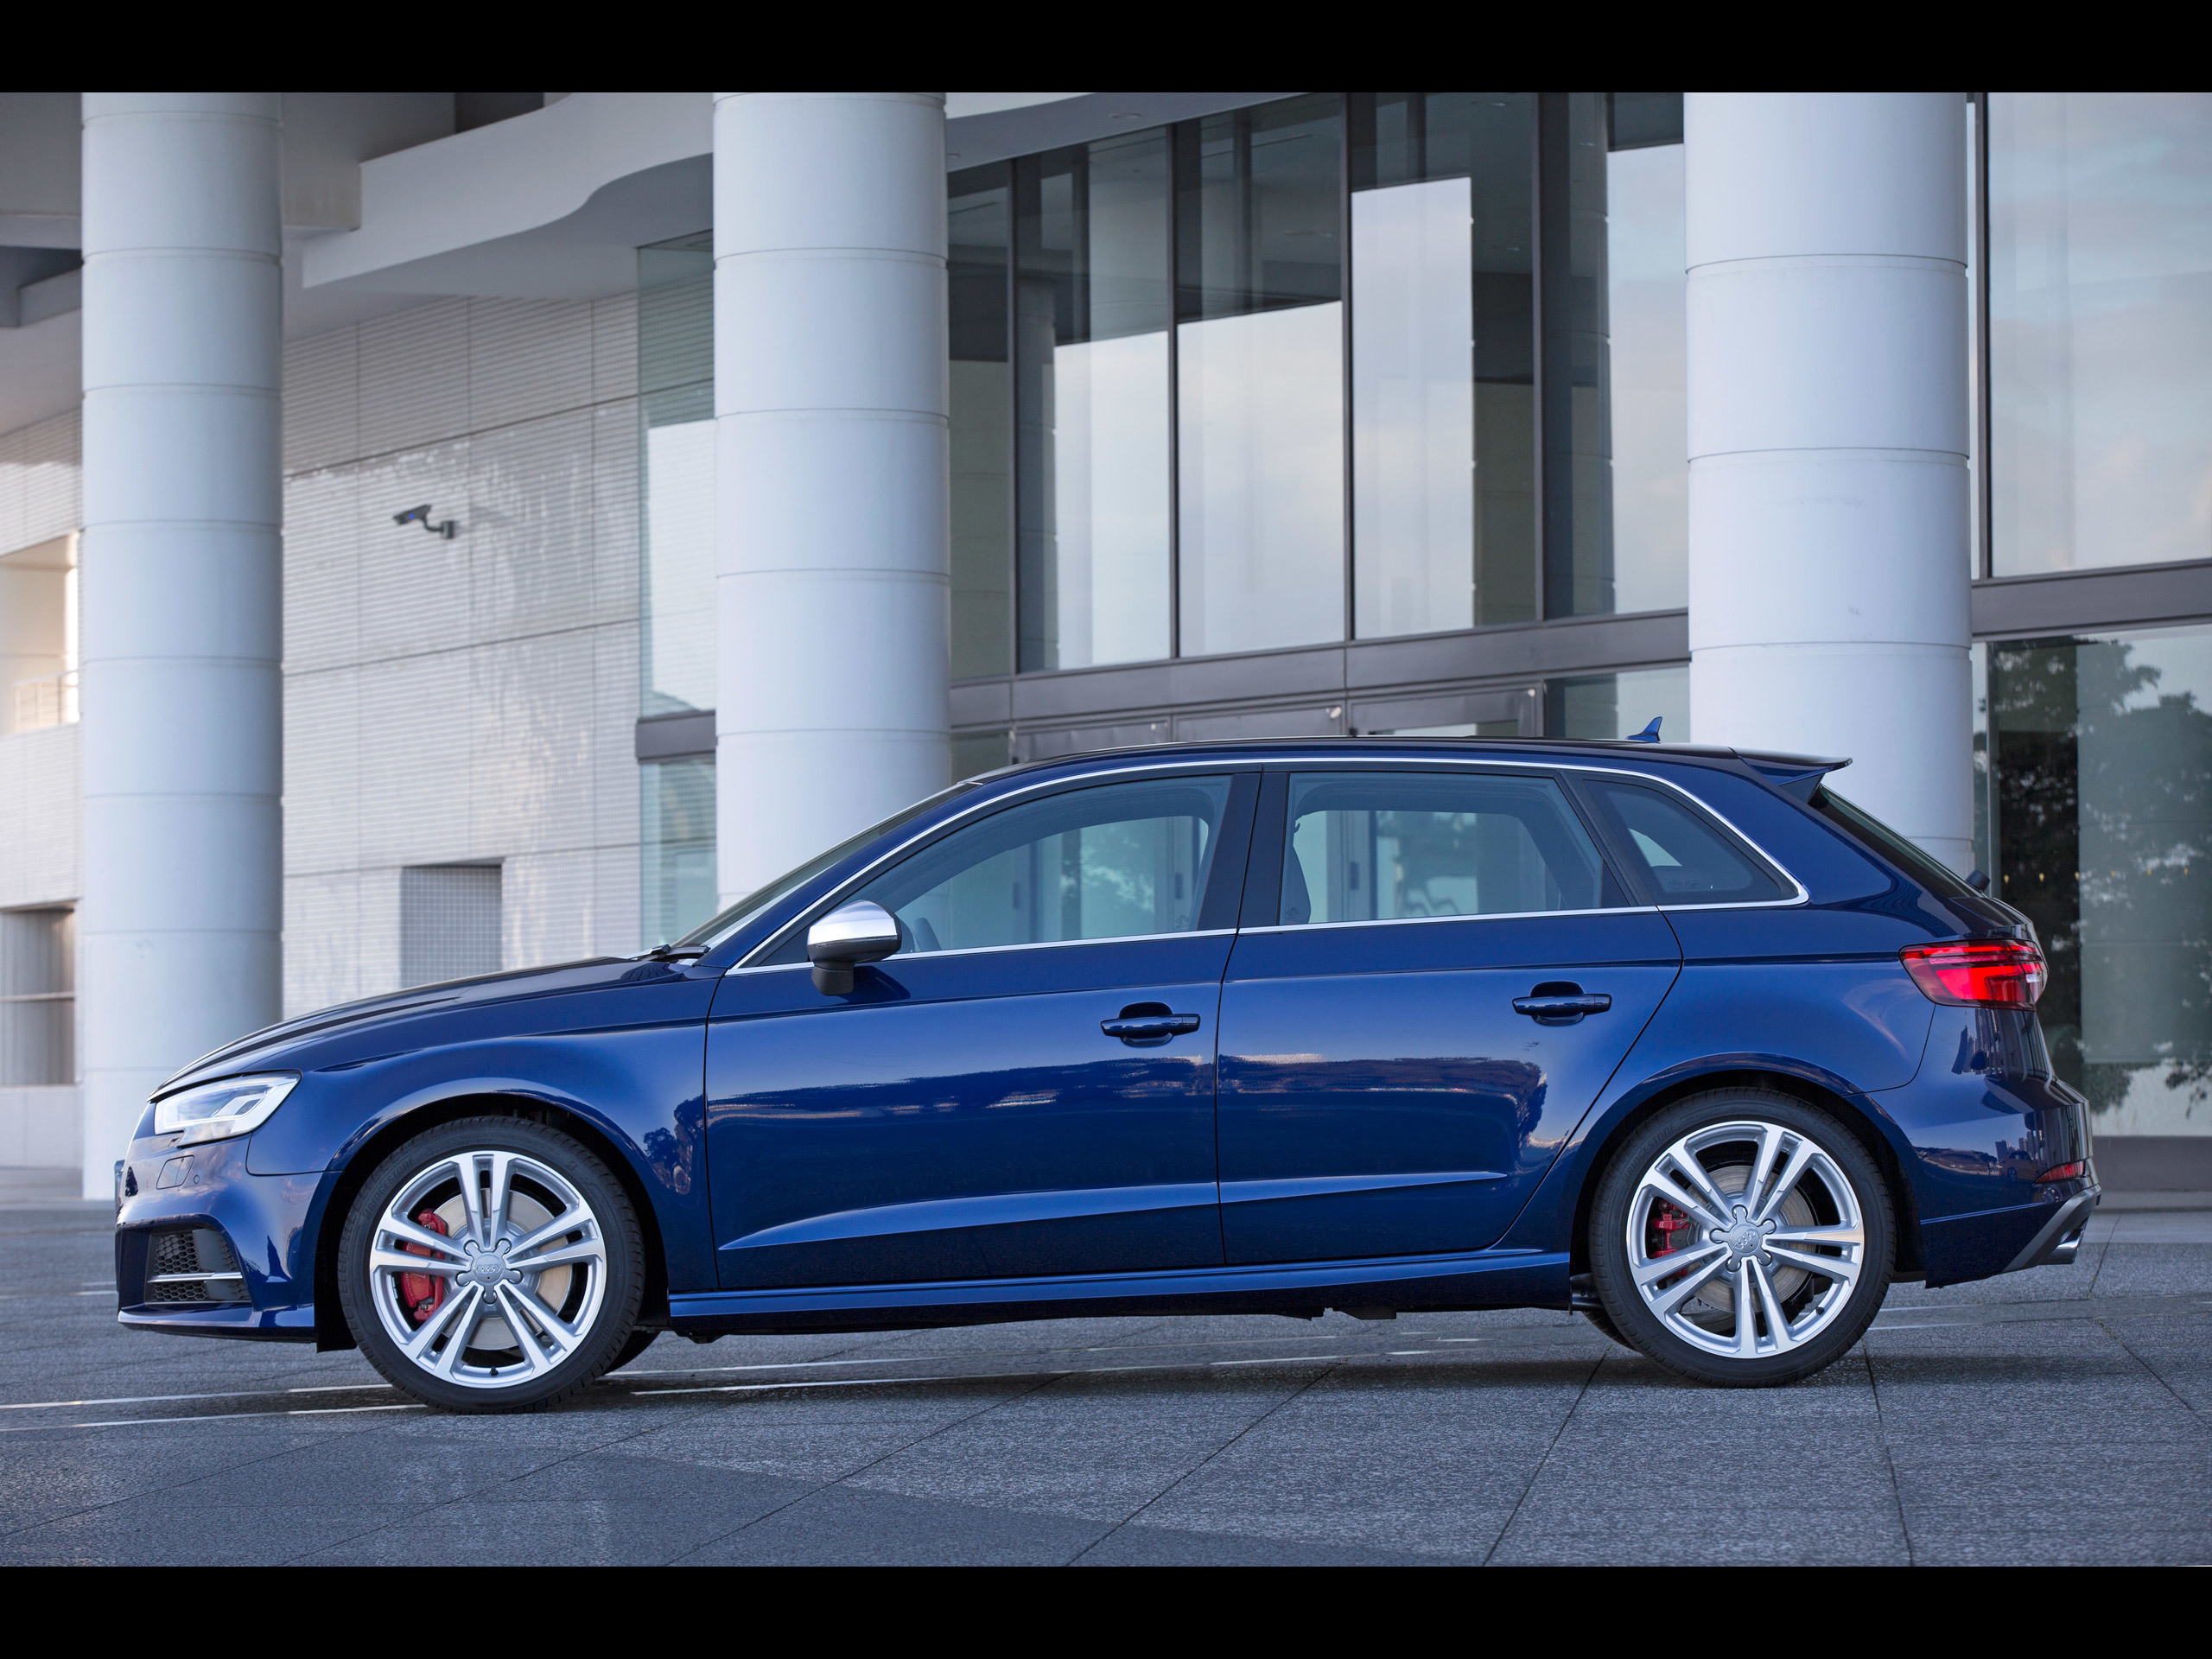 Audi S3 Sportback 2017 - アウディに嵌まる - 壁紙画像ブログ